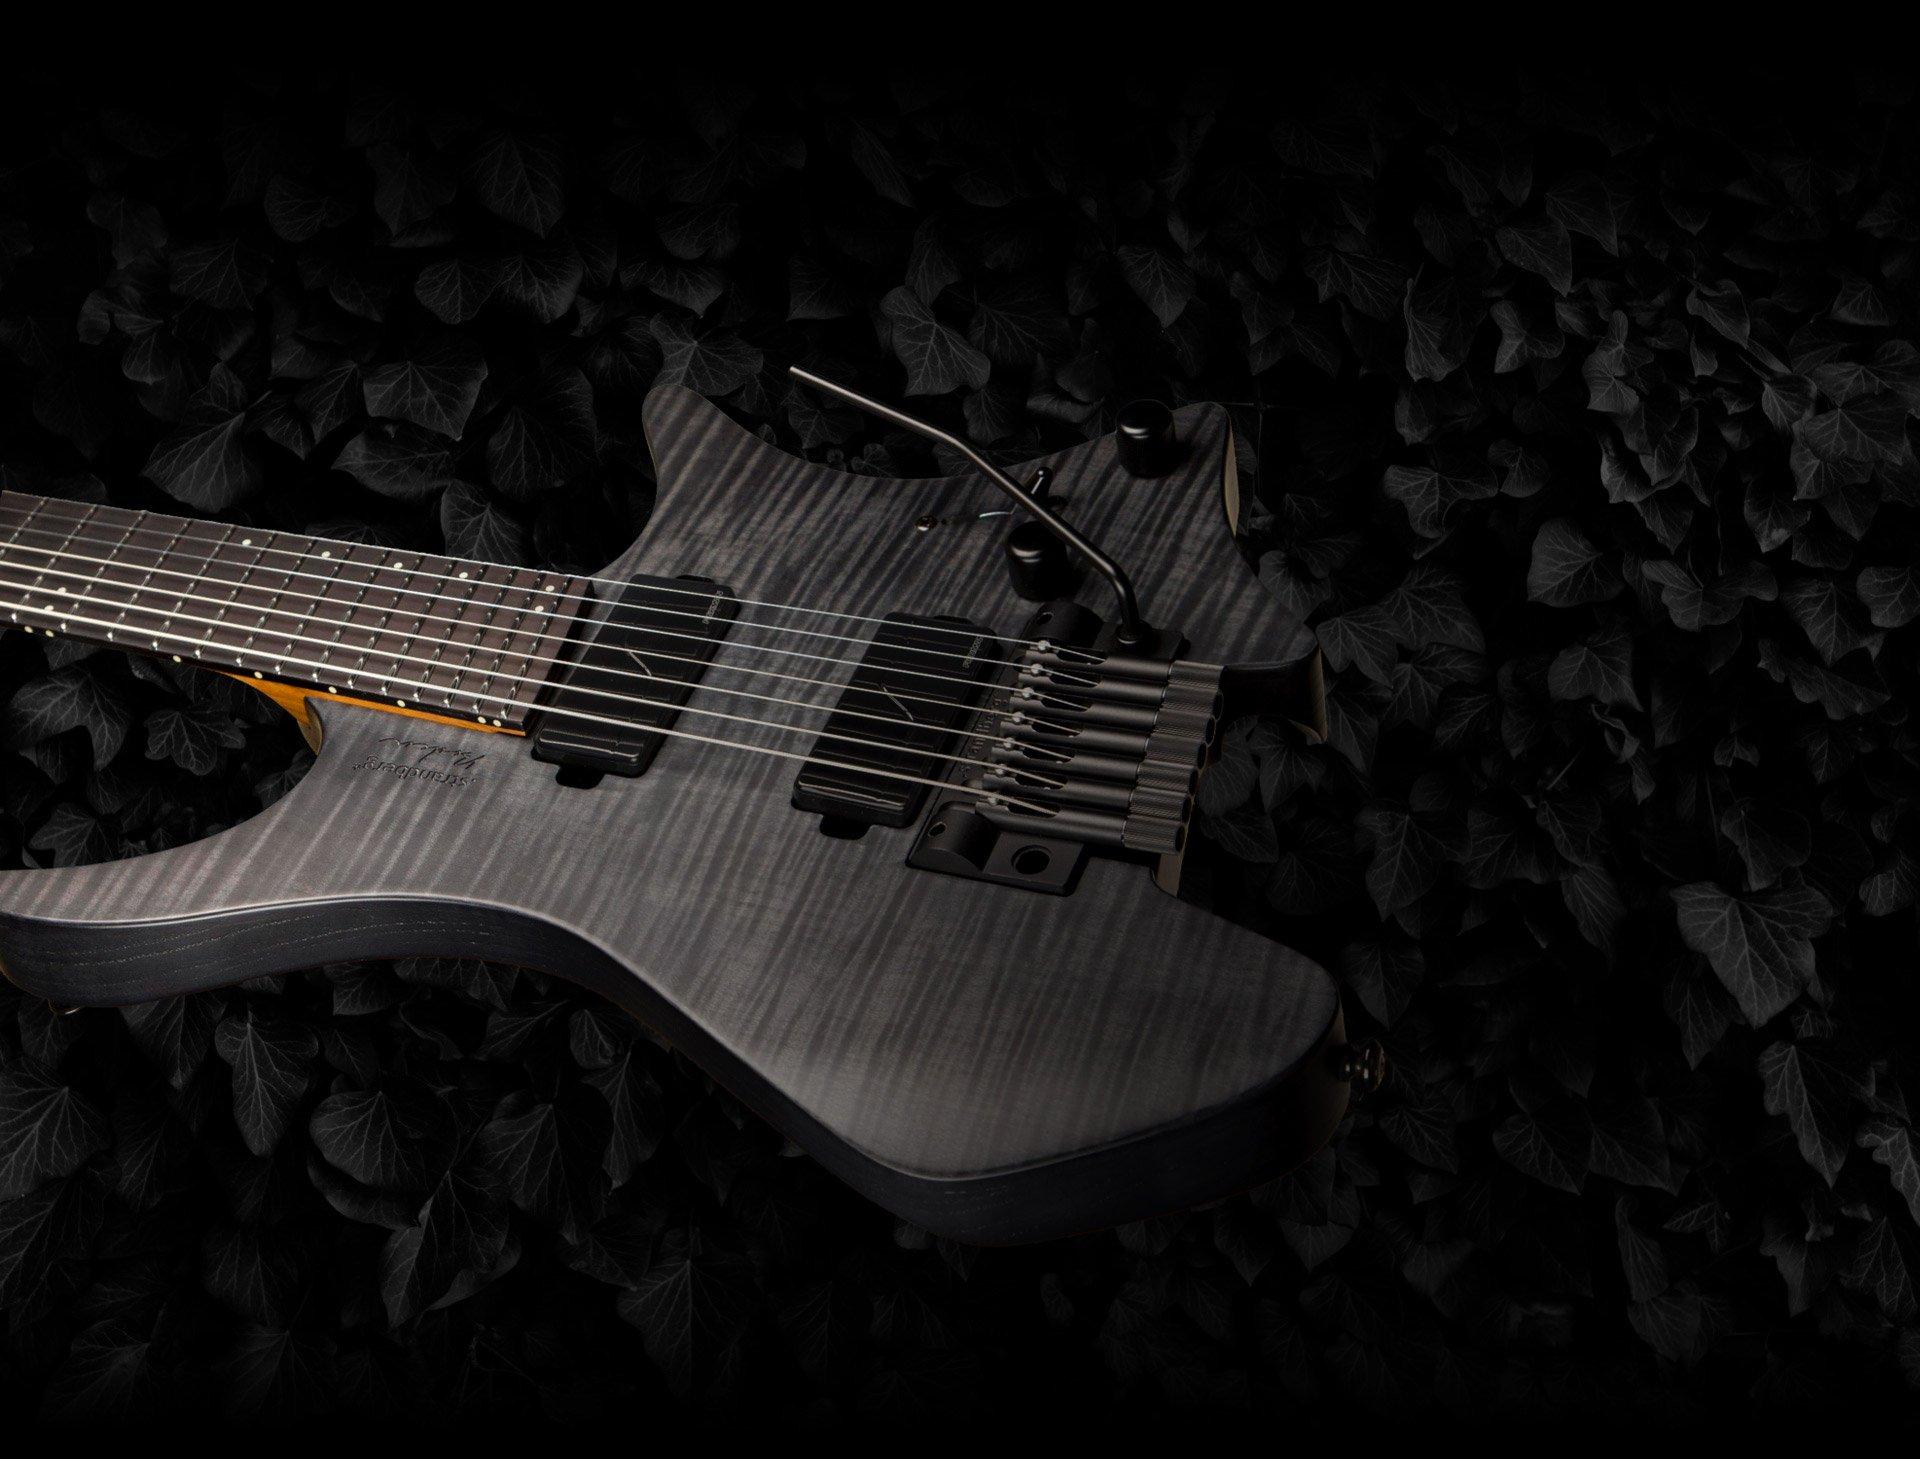 Headless strandberg guitar tremolo 7 string